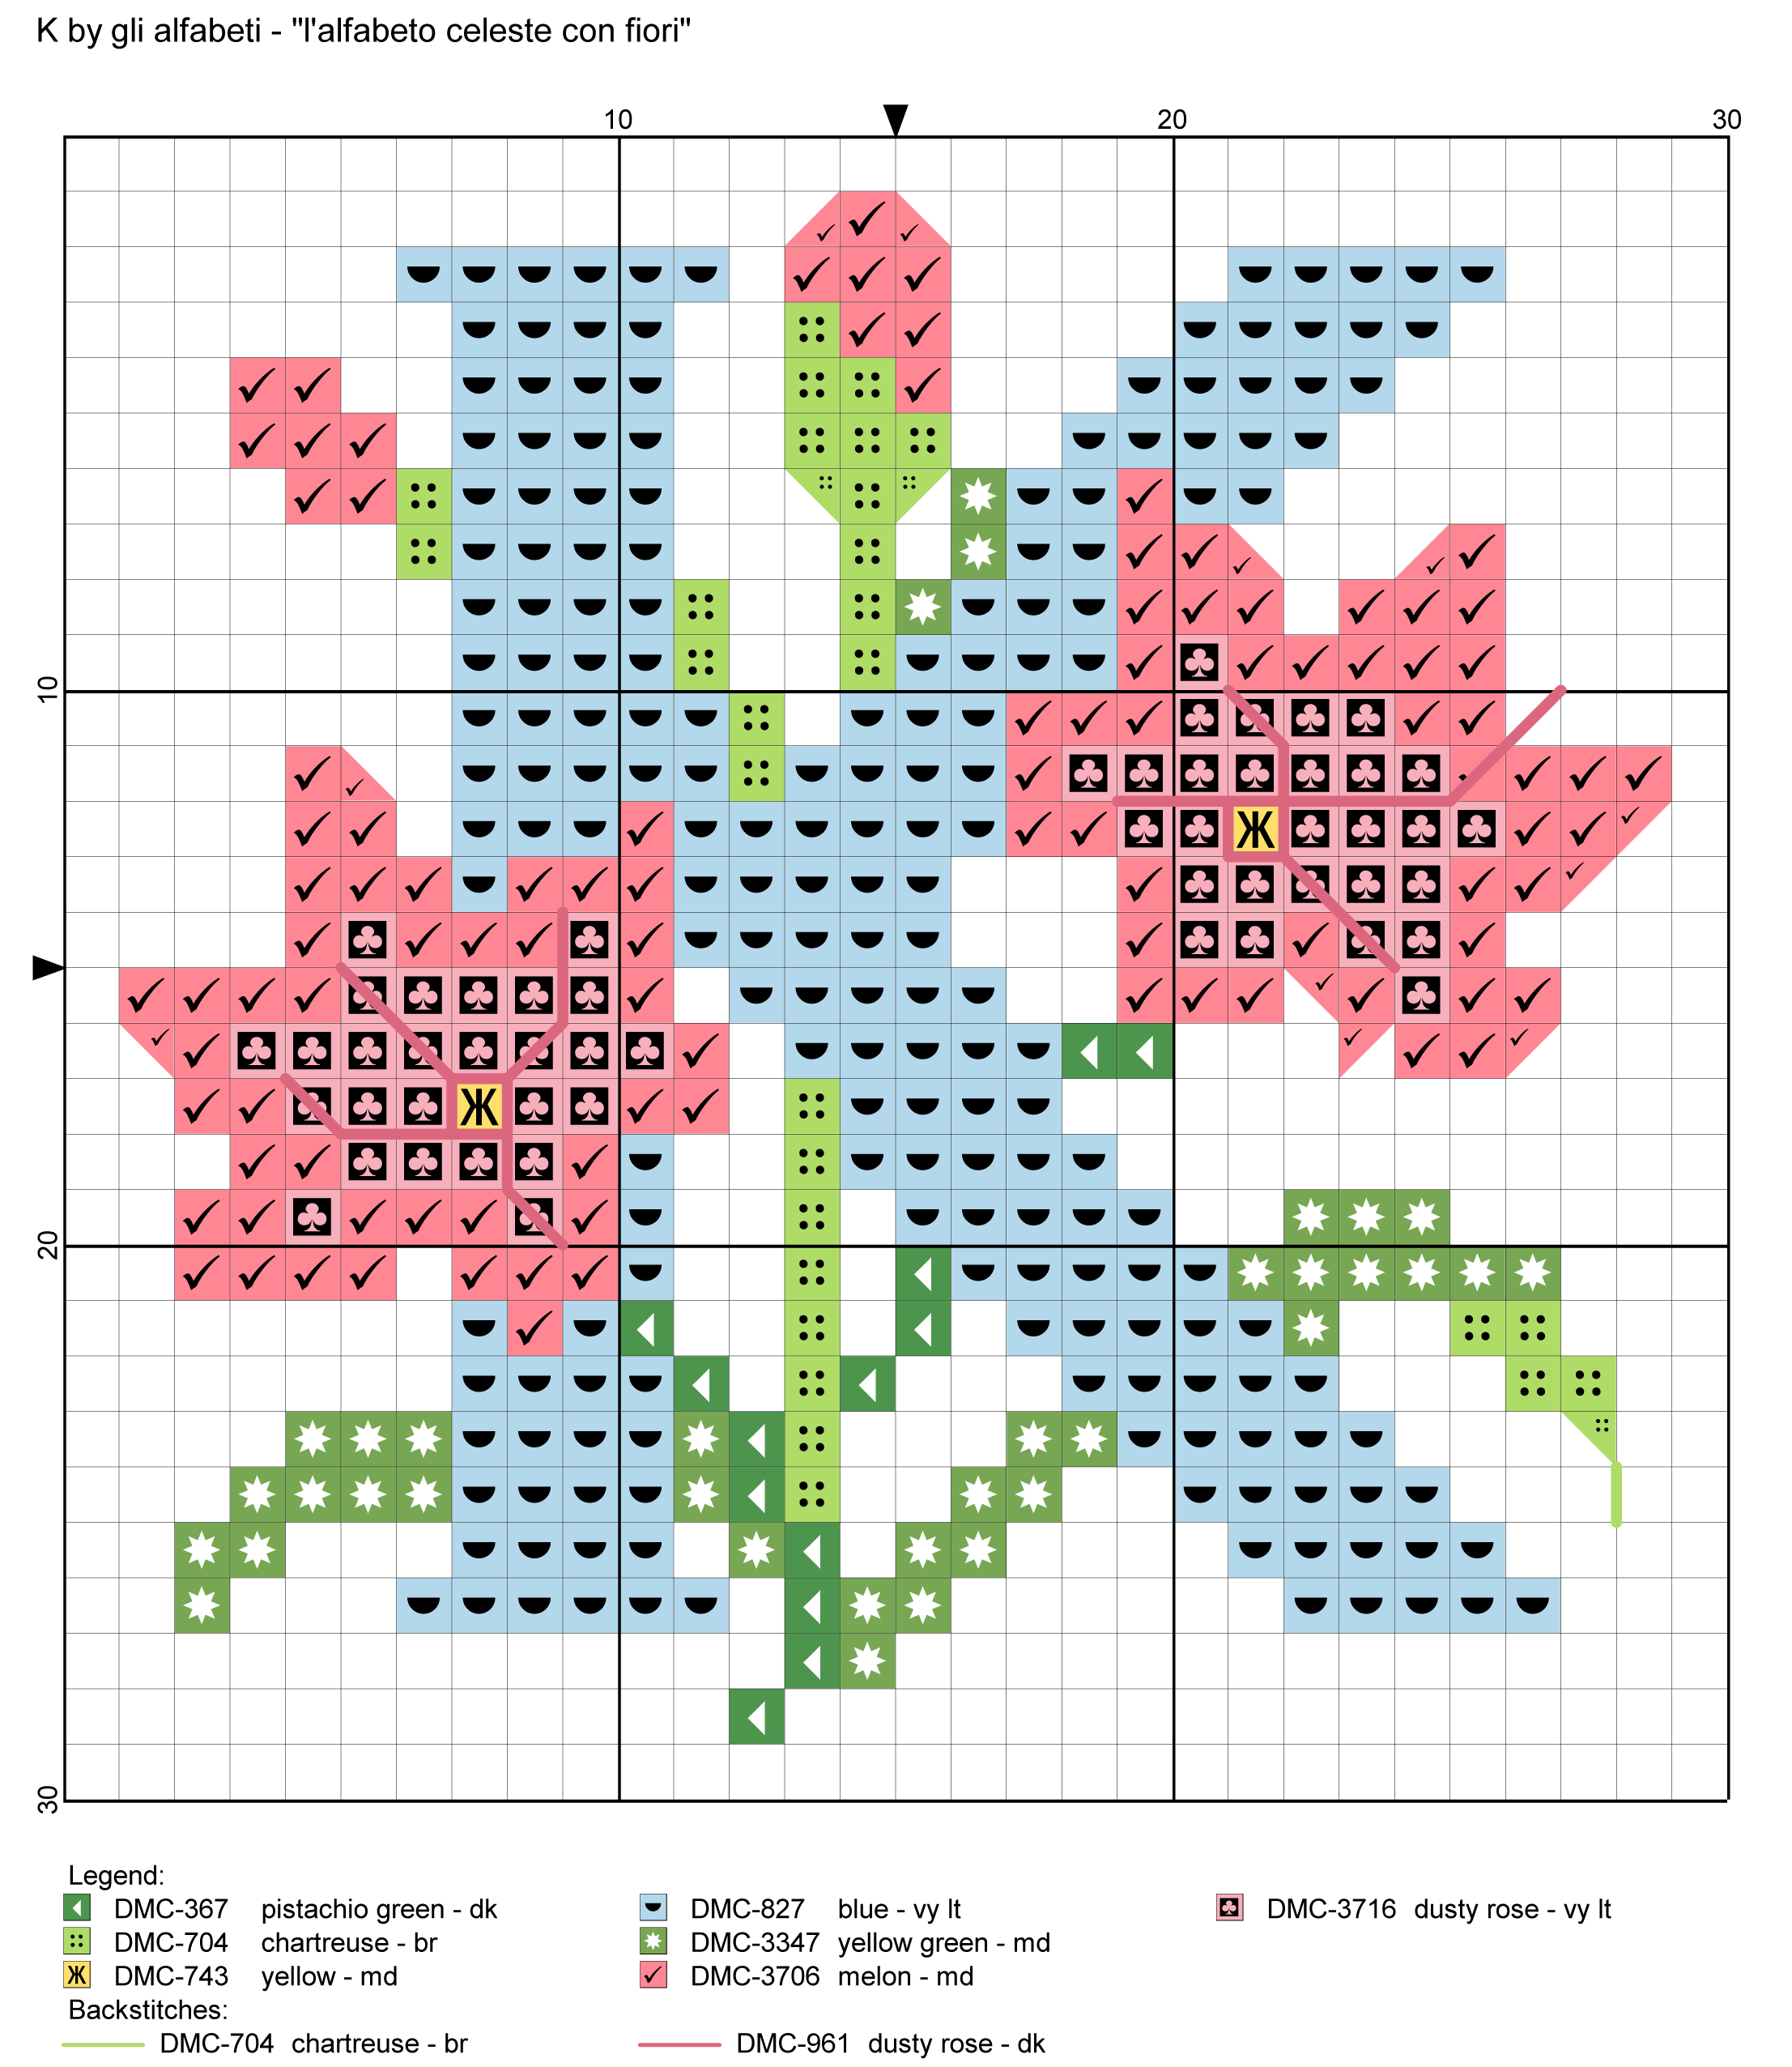 Fiori K.Alfabeto Celeste Con Fiori K Cross Stitch Alphabet Cross Stitch